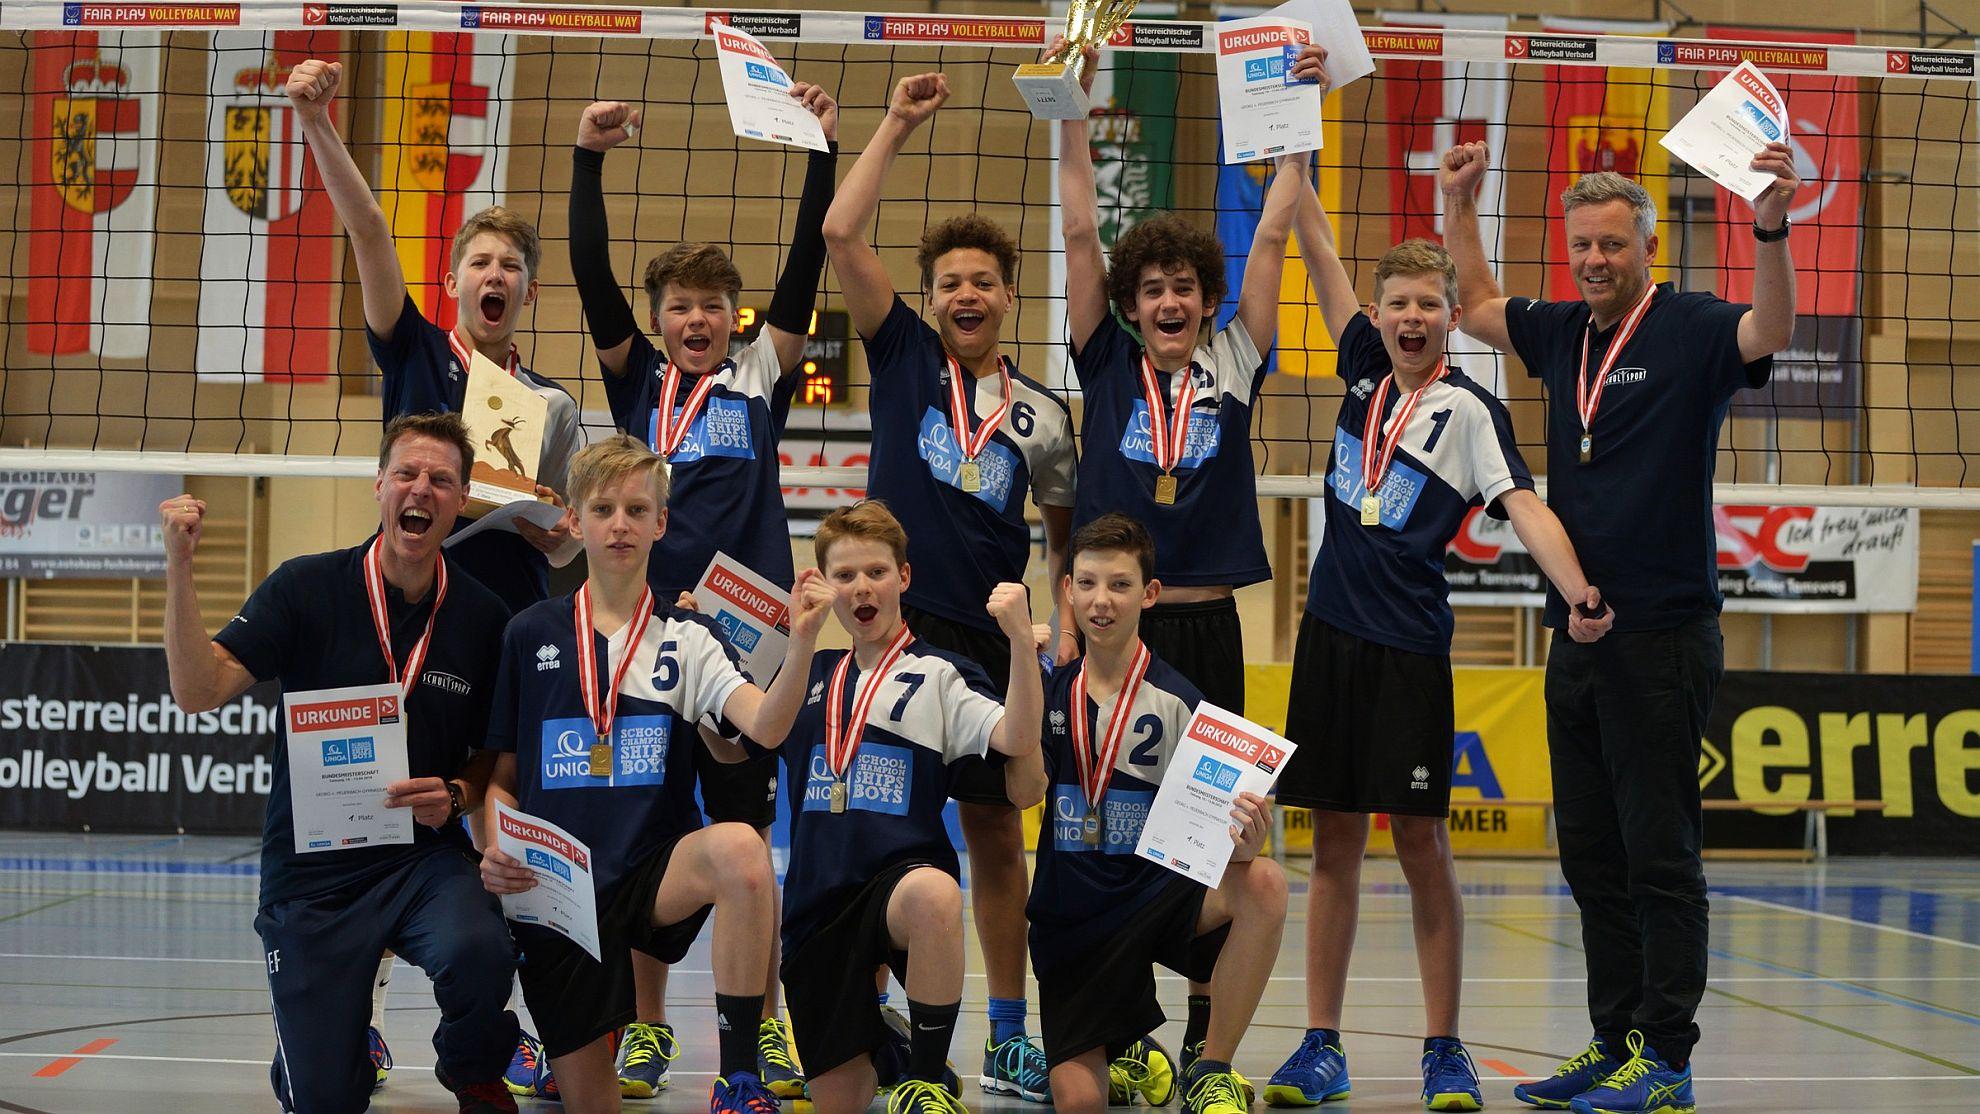 UNIQA School Championships Boys 2018 - FOTO © SVV/Strauß